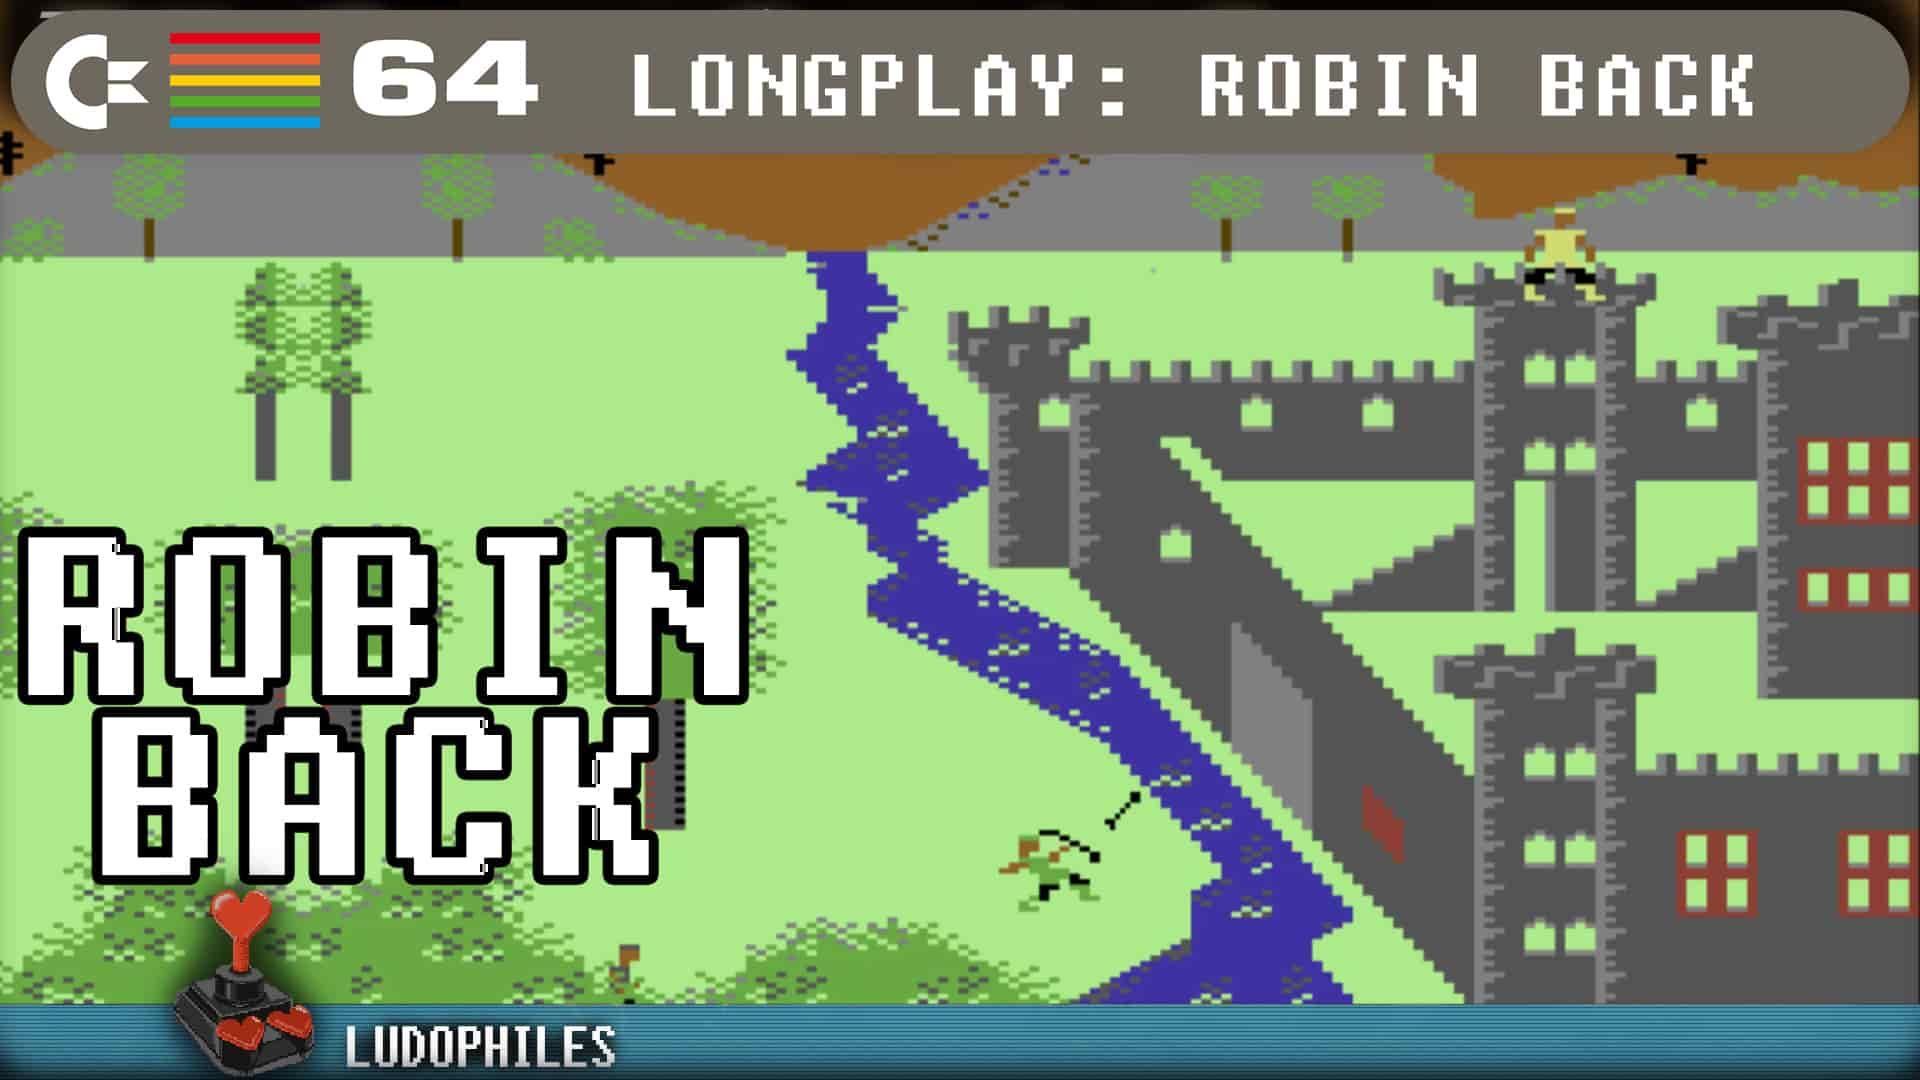 Robin Back C64 Longplay